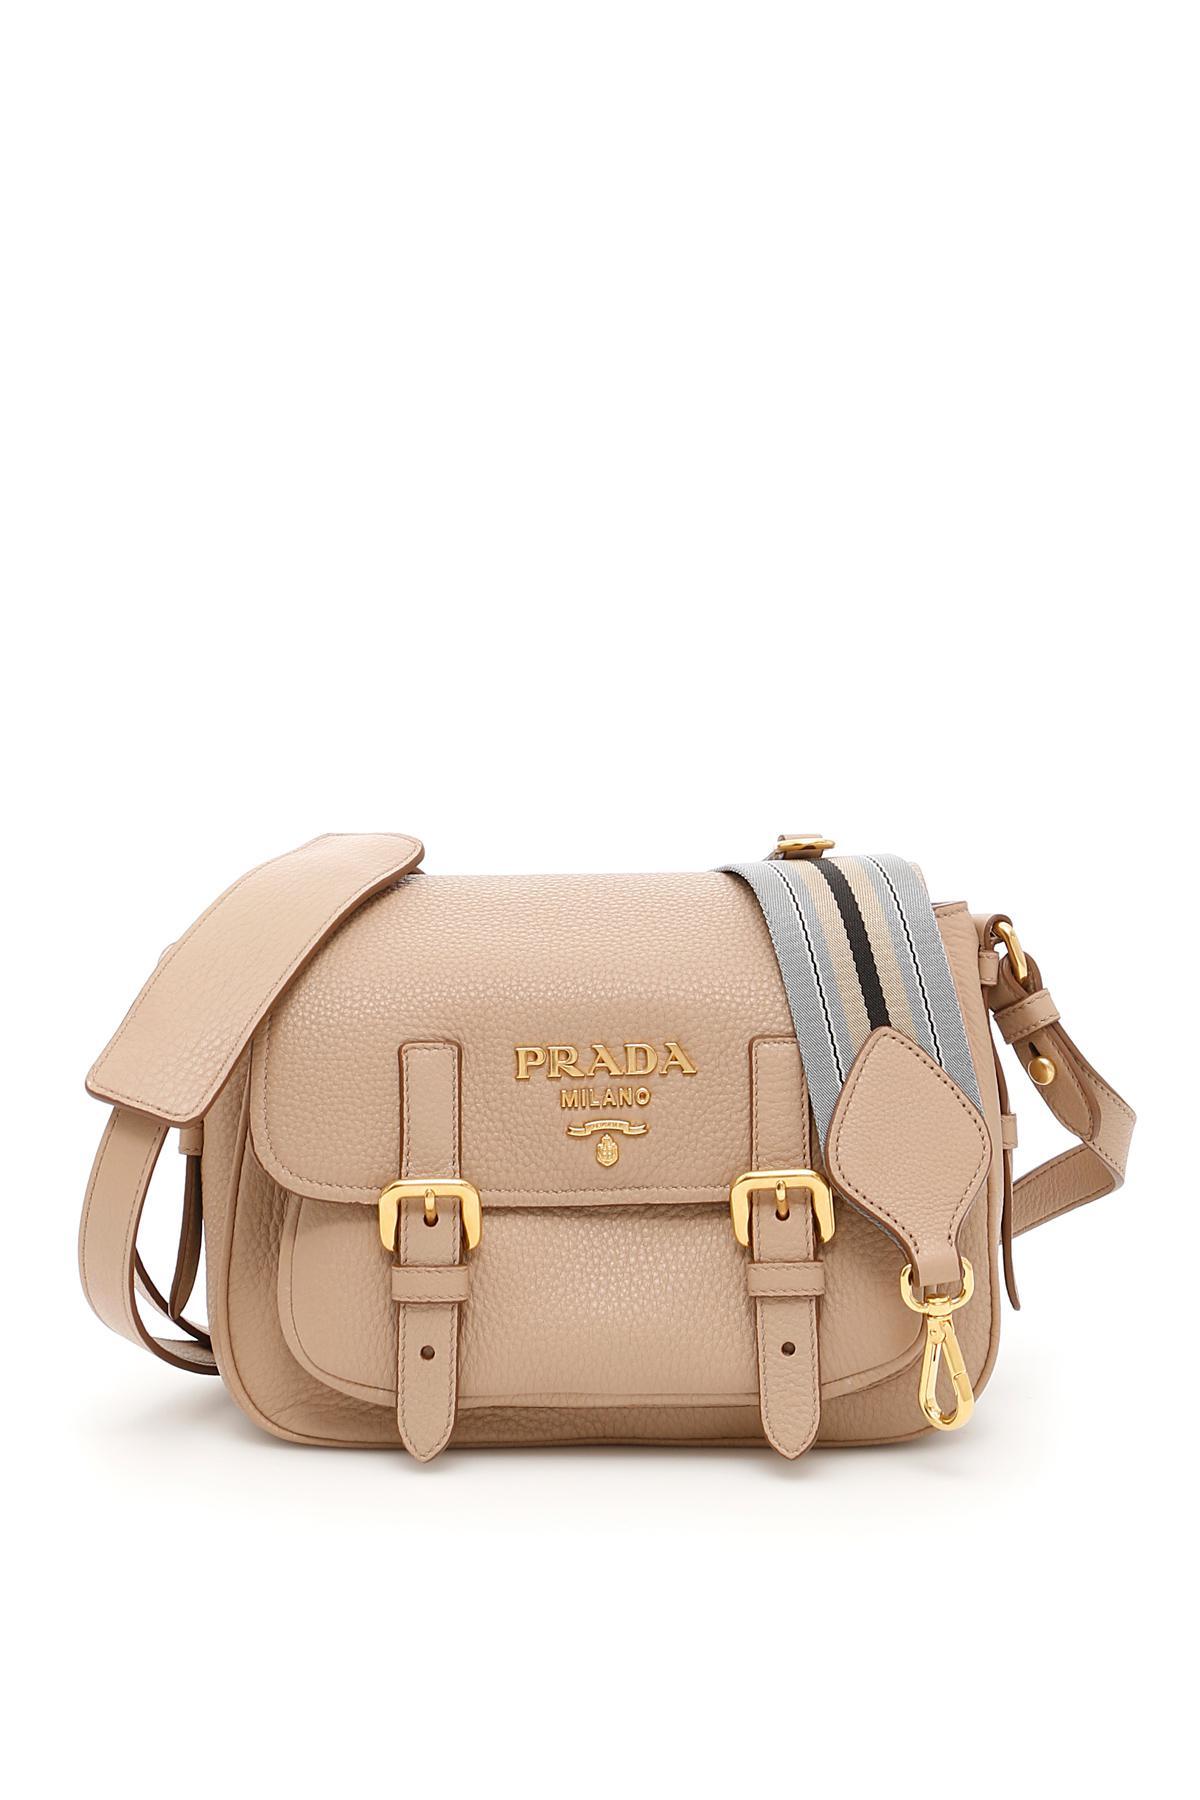 bd7bce87f3aa Prada Deer-print Leather Bag in Natural - Lyst